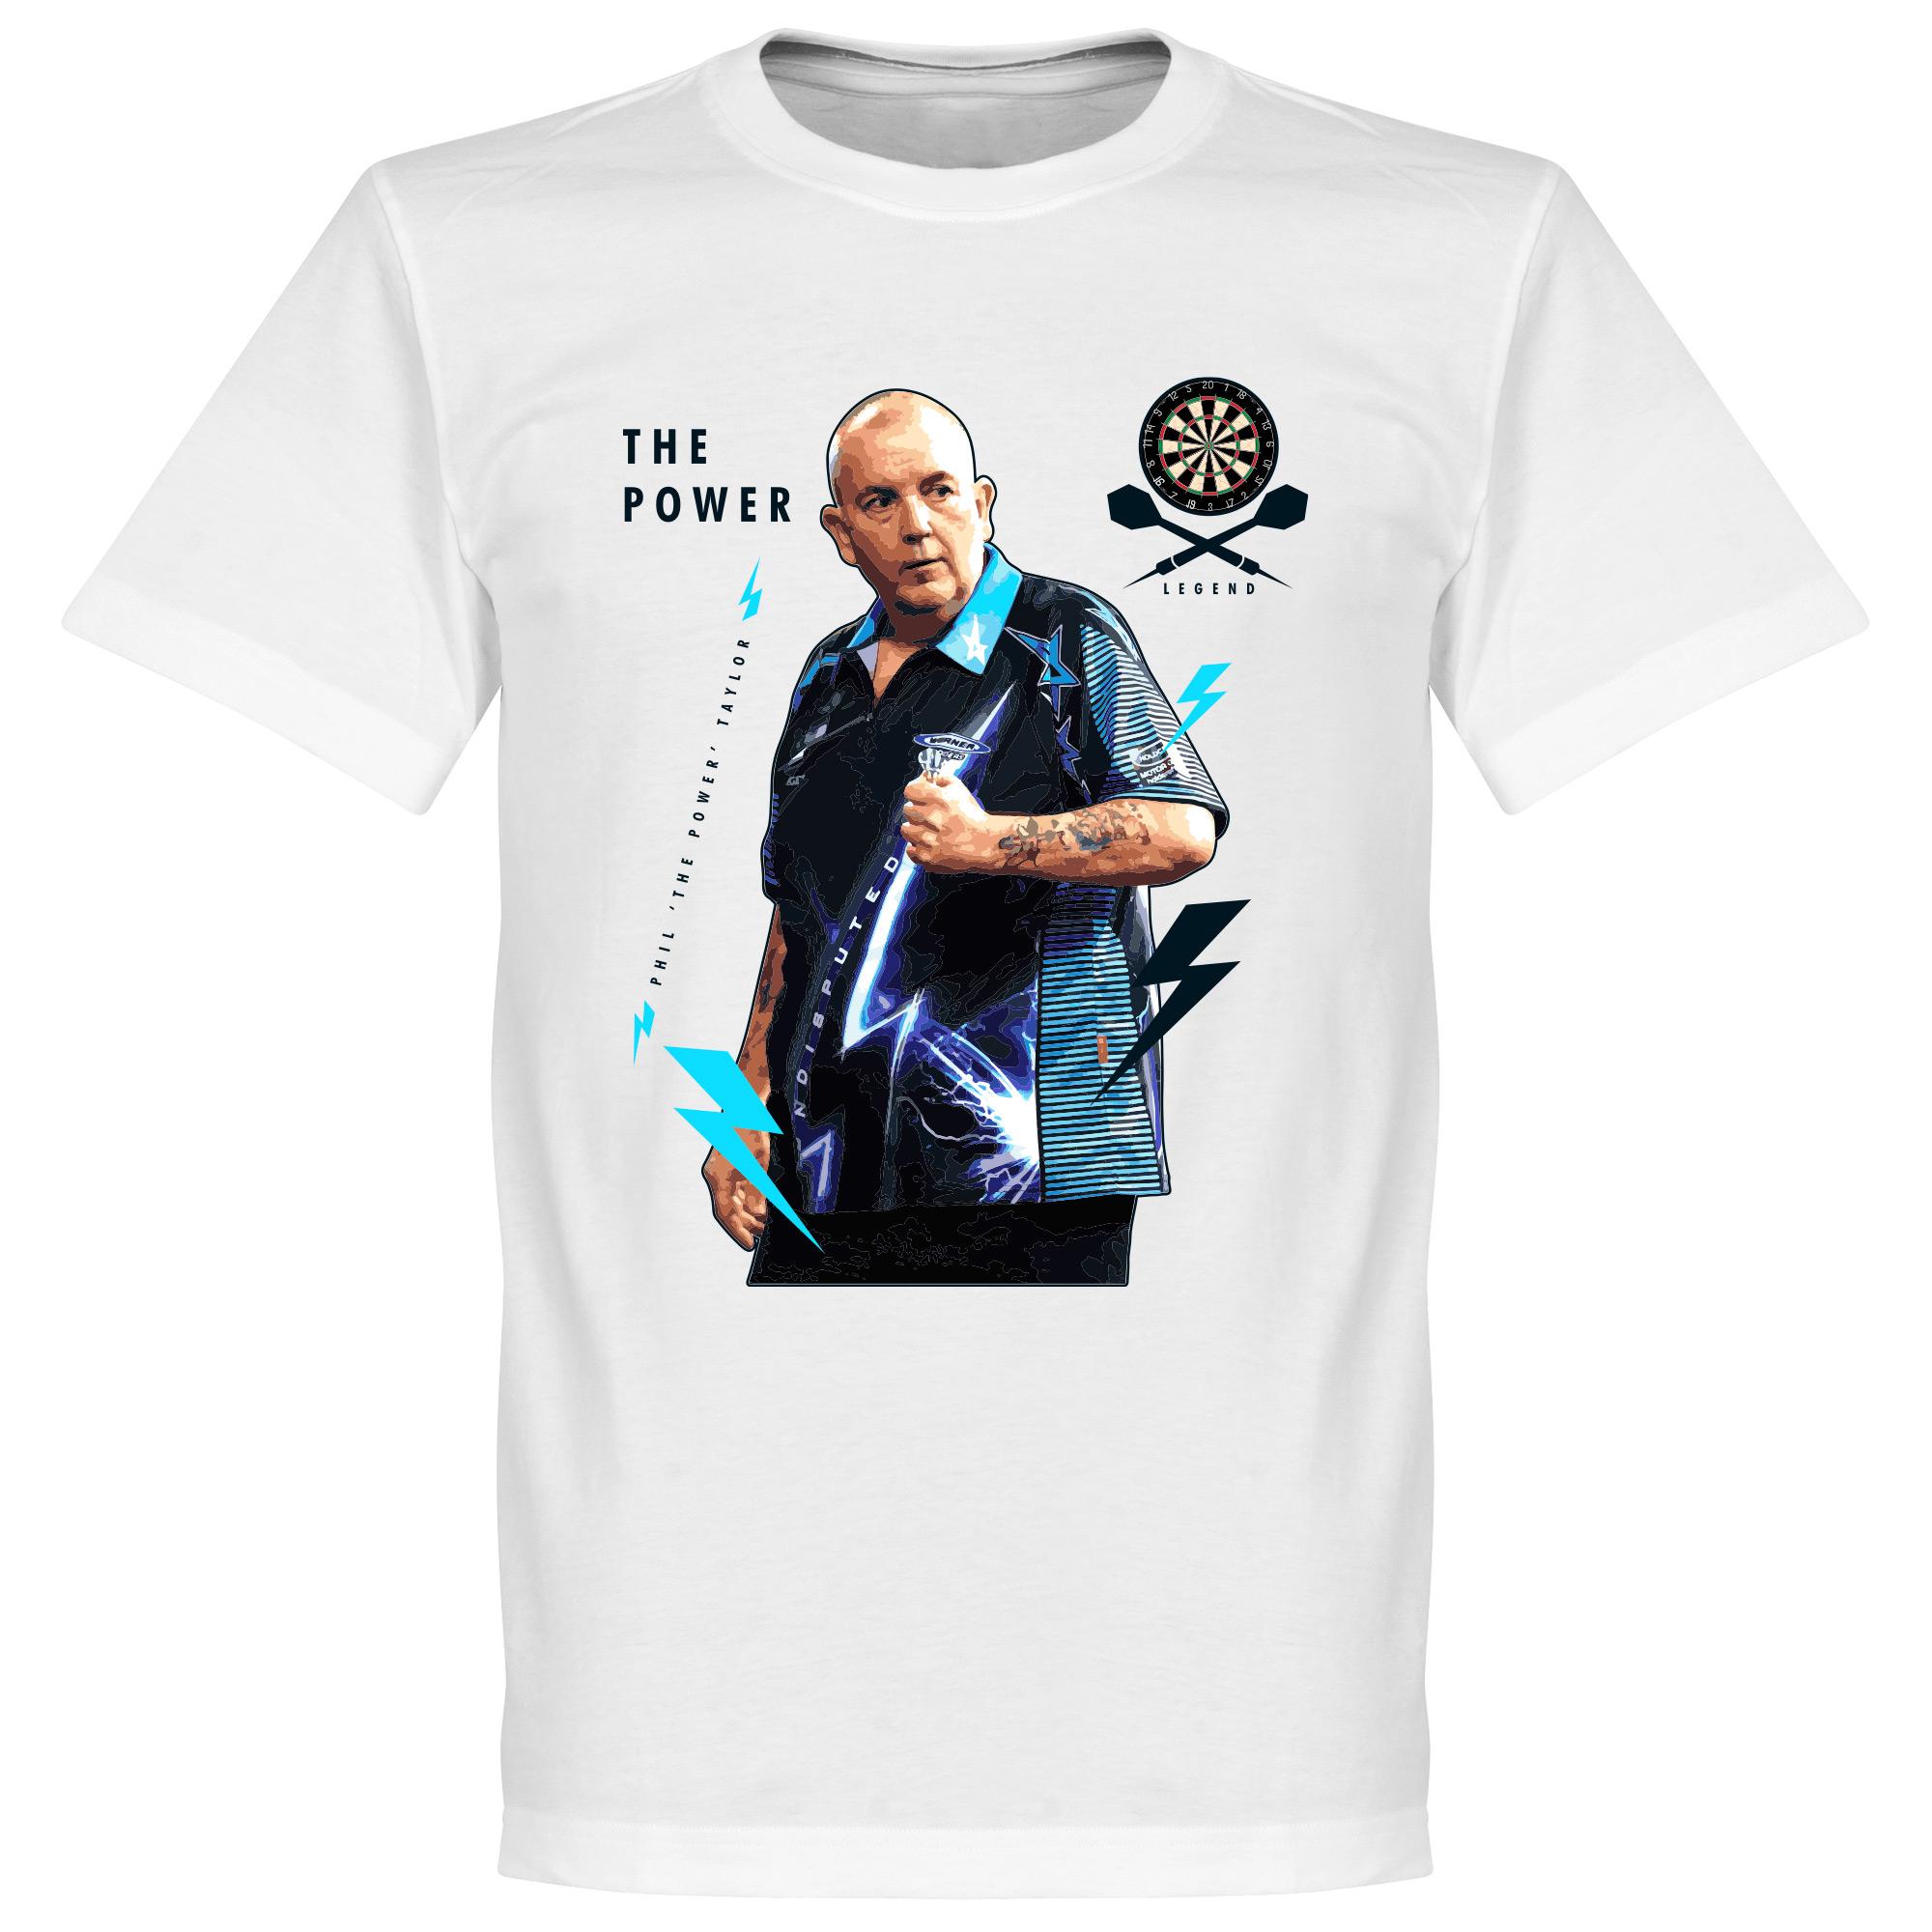 Phil The Power Taylor Darts T-Shirt - XXL